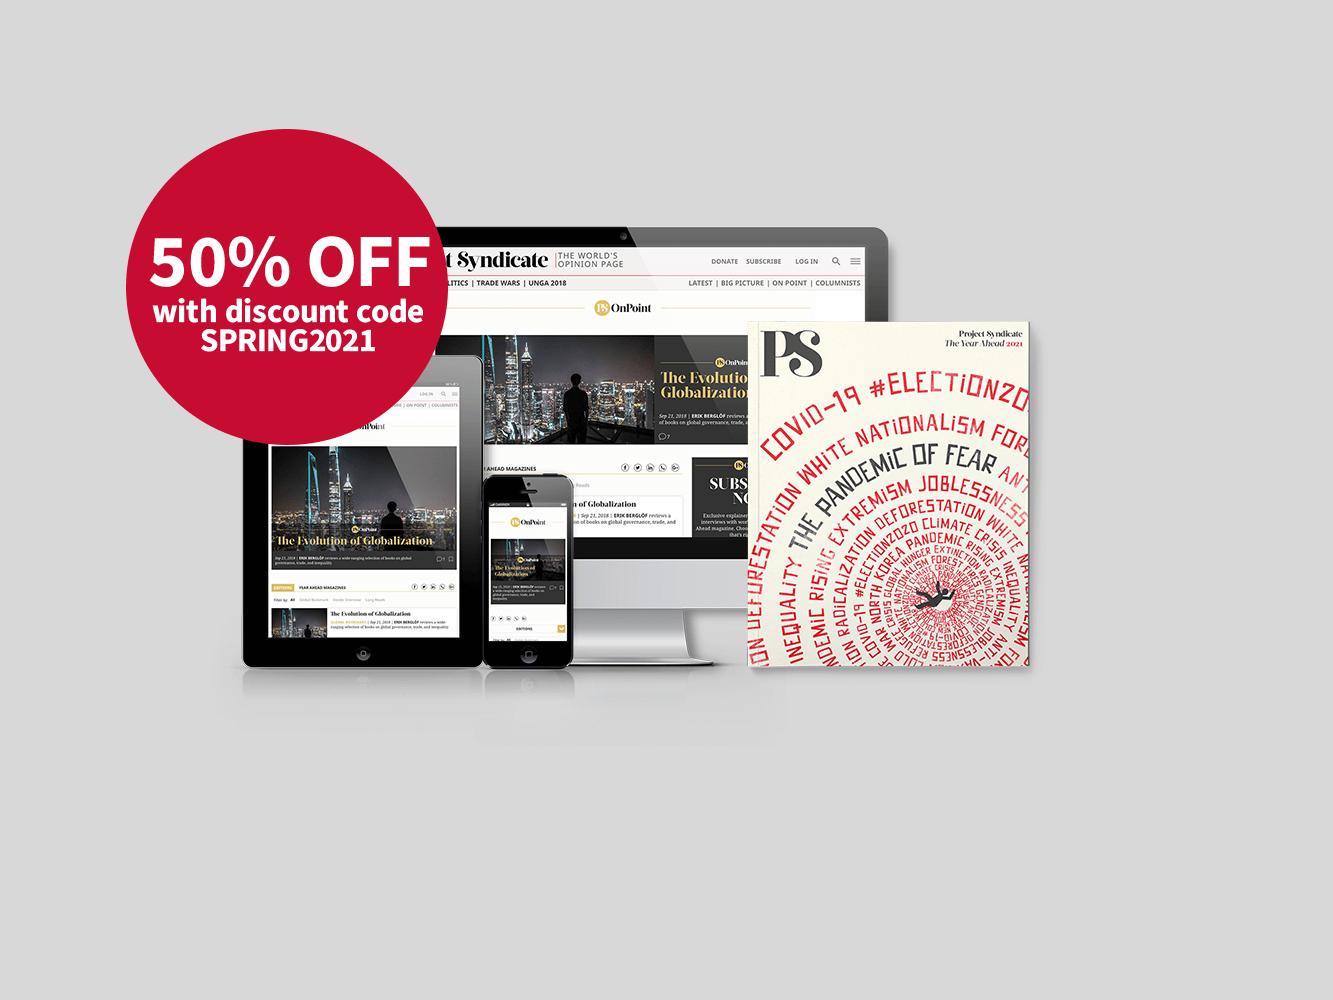 Bundle2021_web_discount_spring2021